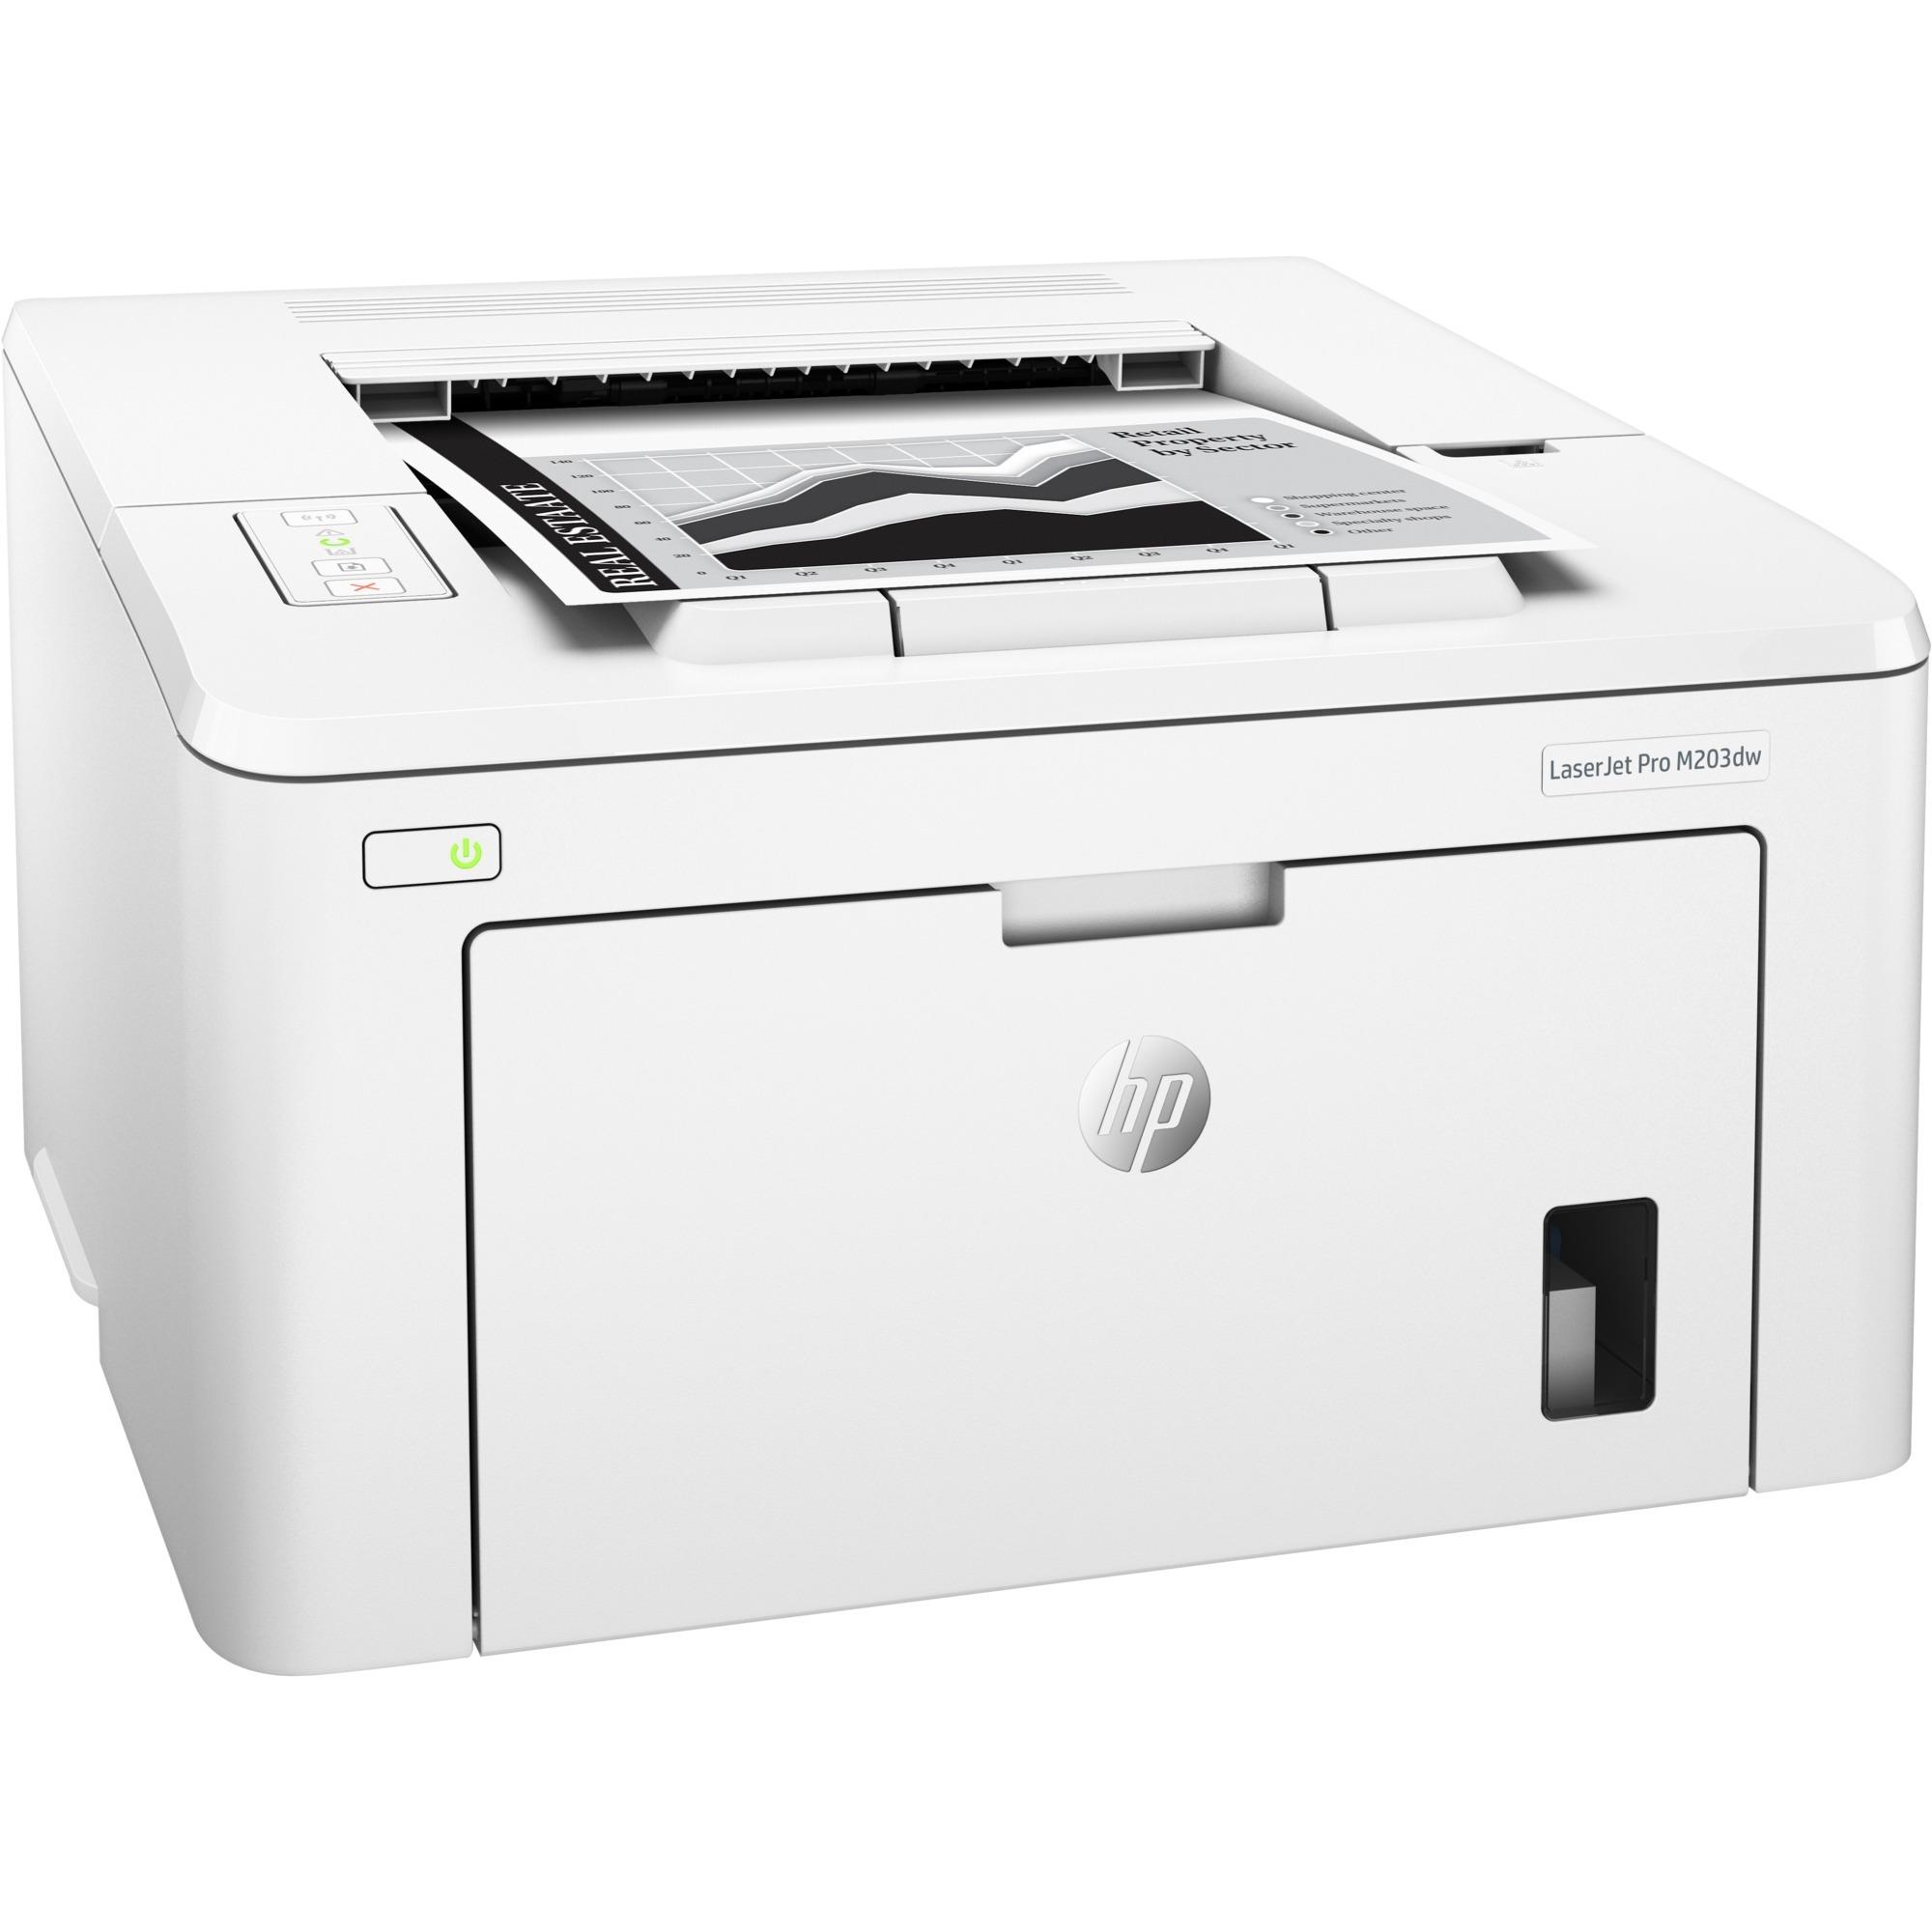 LaserJet M203dw 1200 x 1200 DPI A4 Wifi, Impresora láser